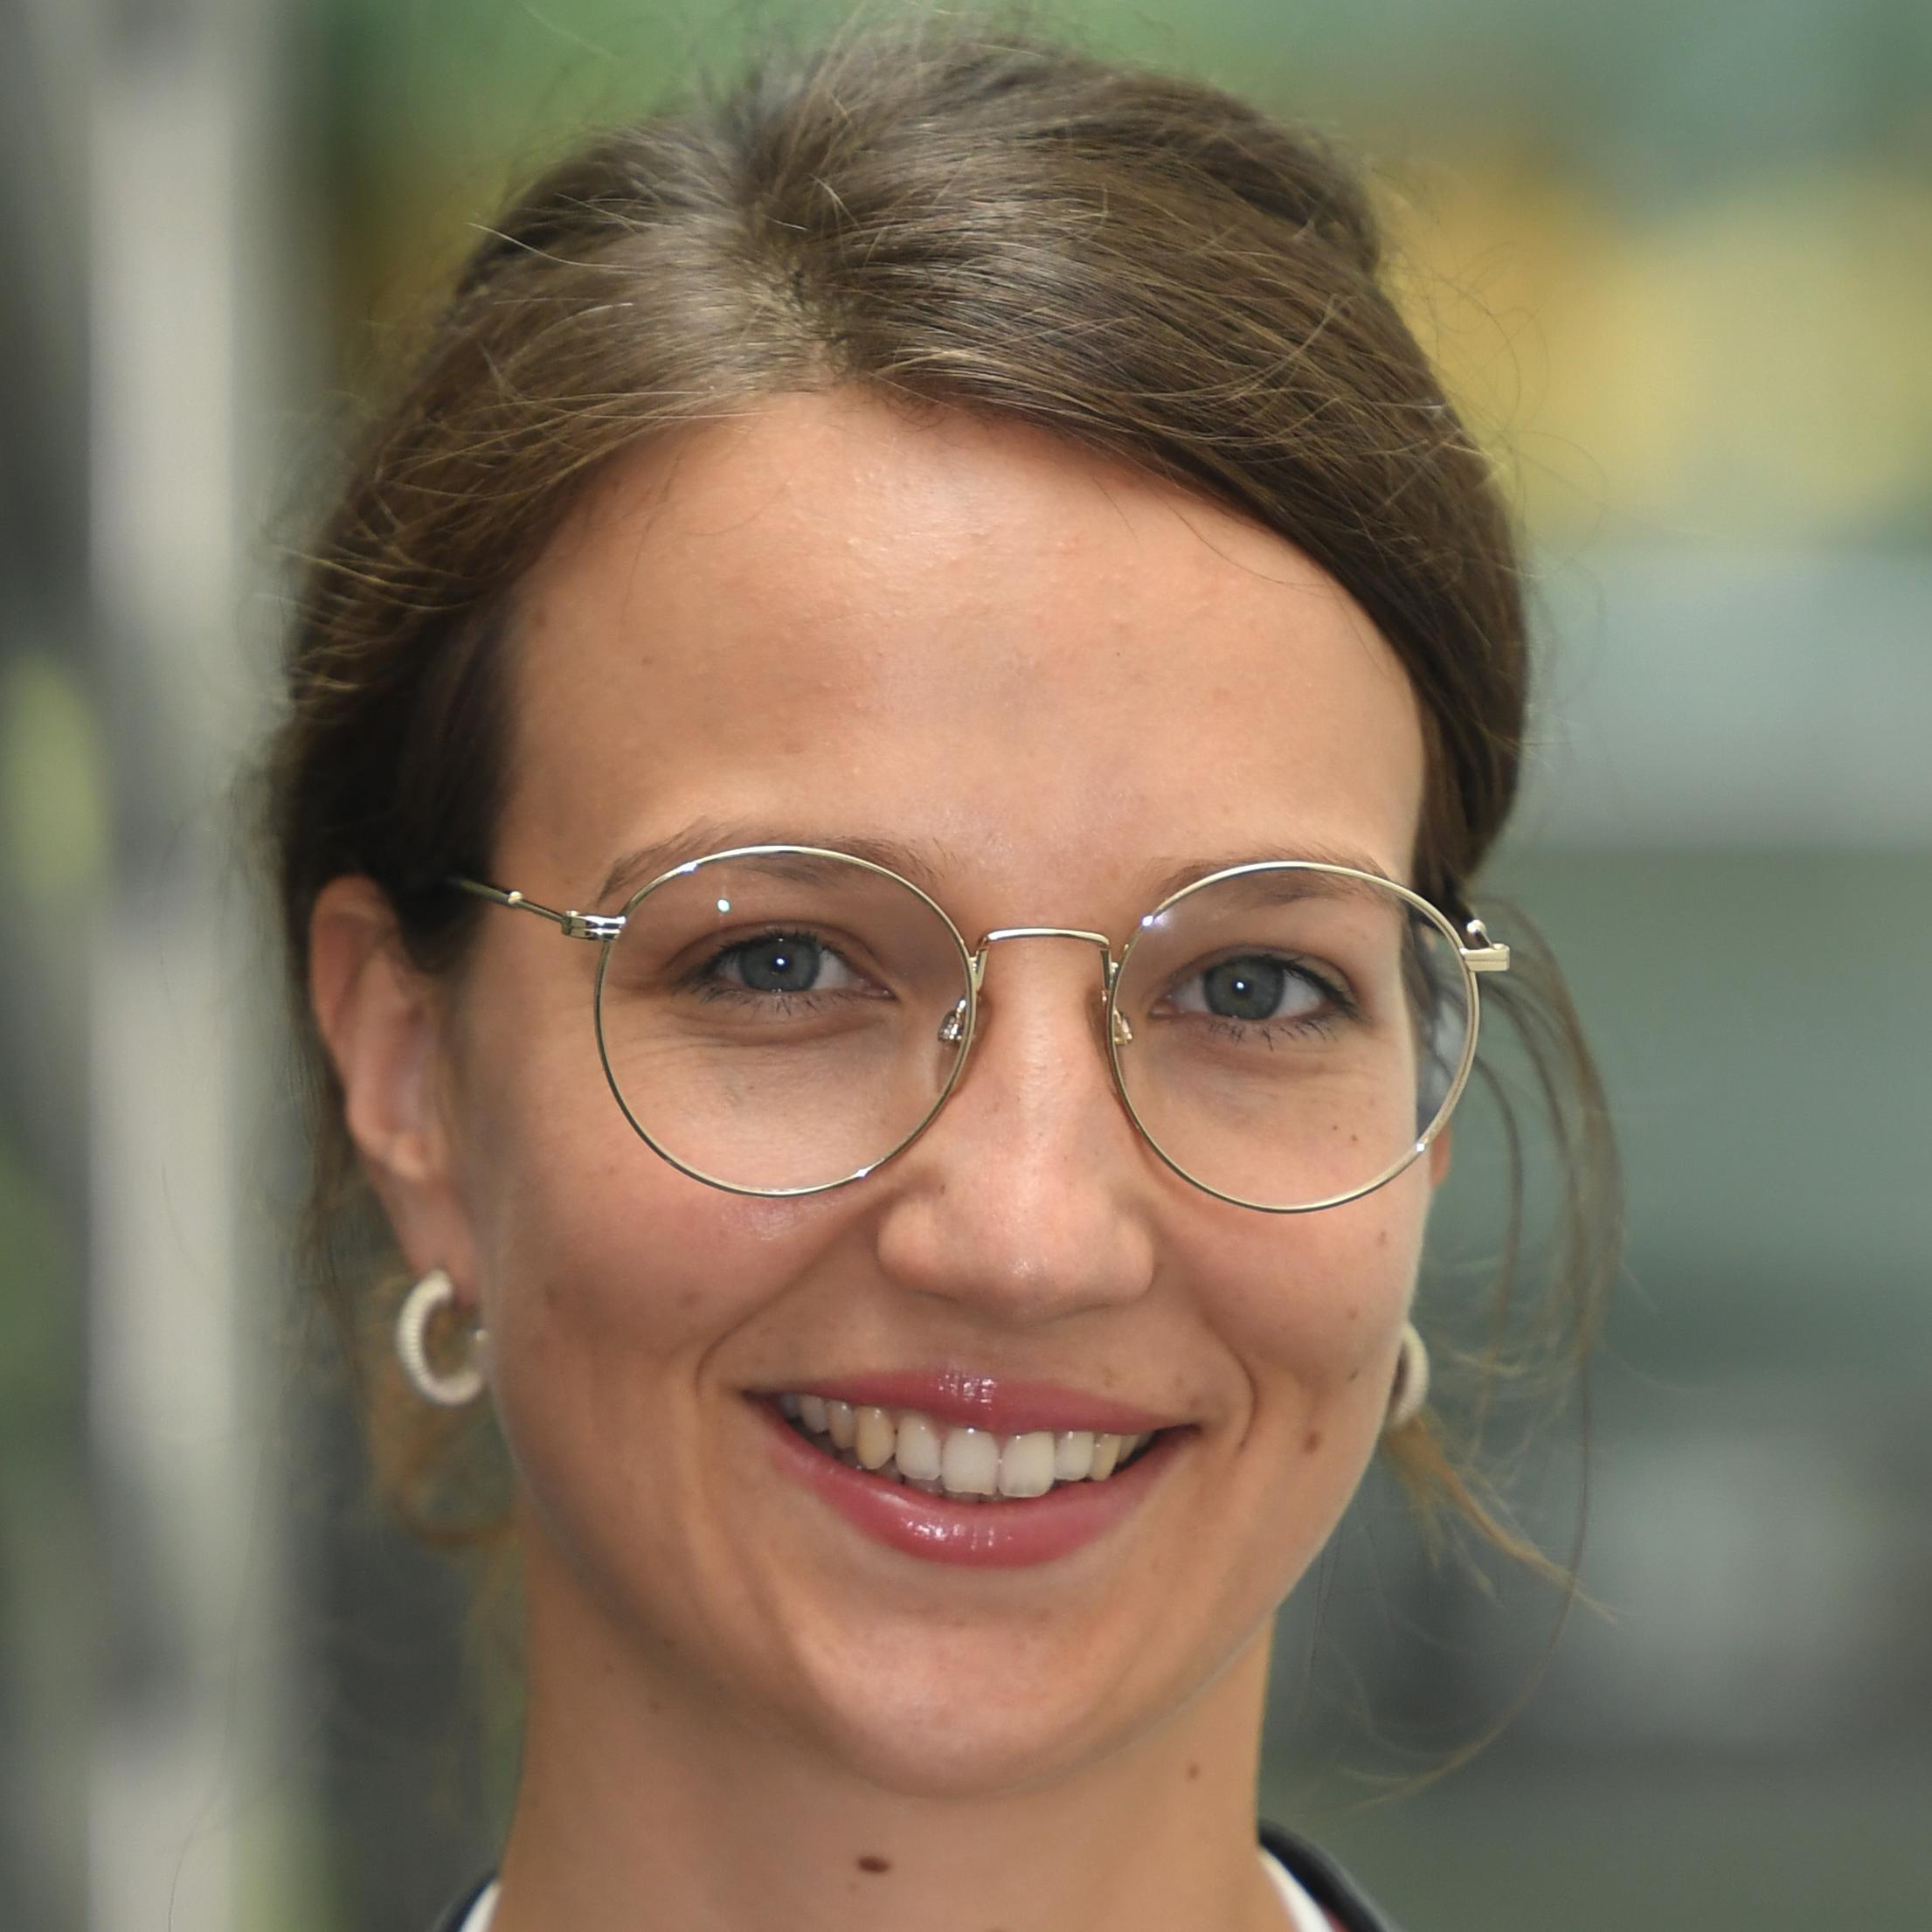 Verena Schälter